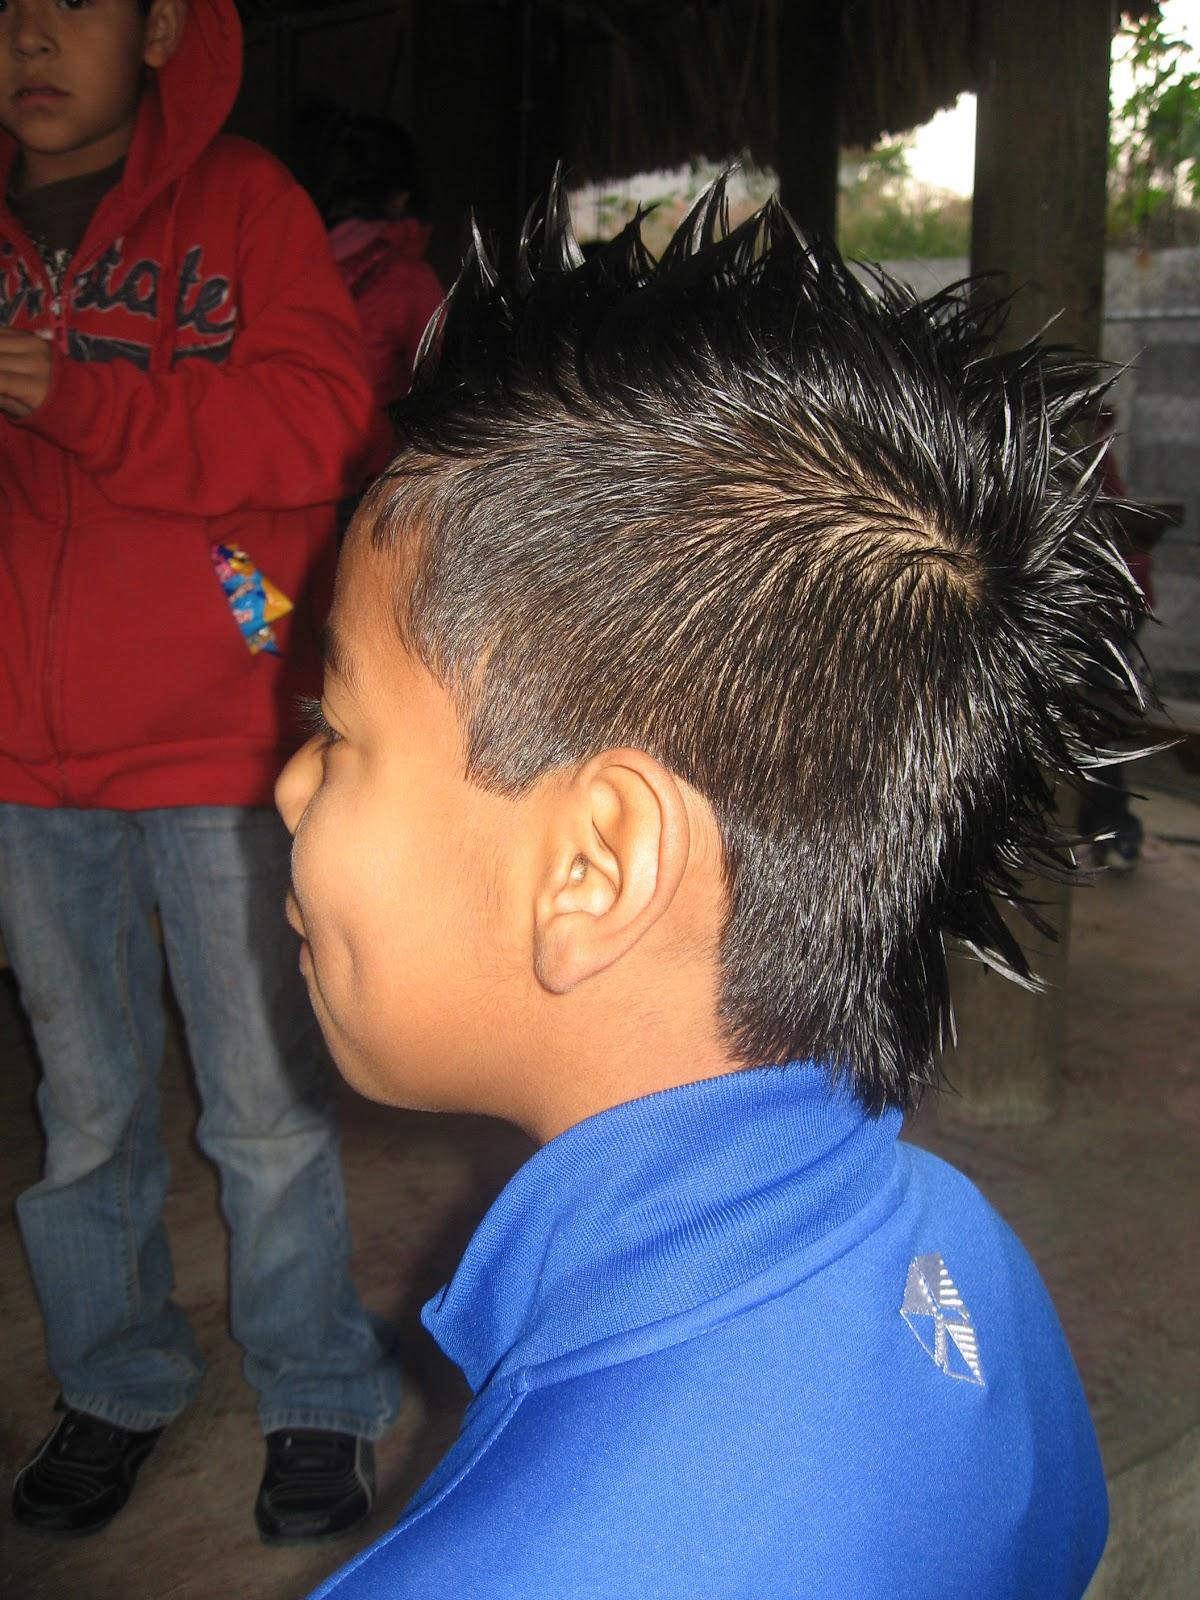 ... haircut back view cristiano ronaldo haircut mohawk 2013 cristiano